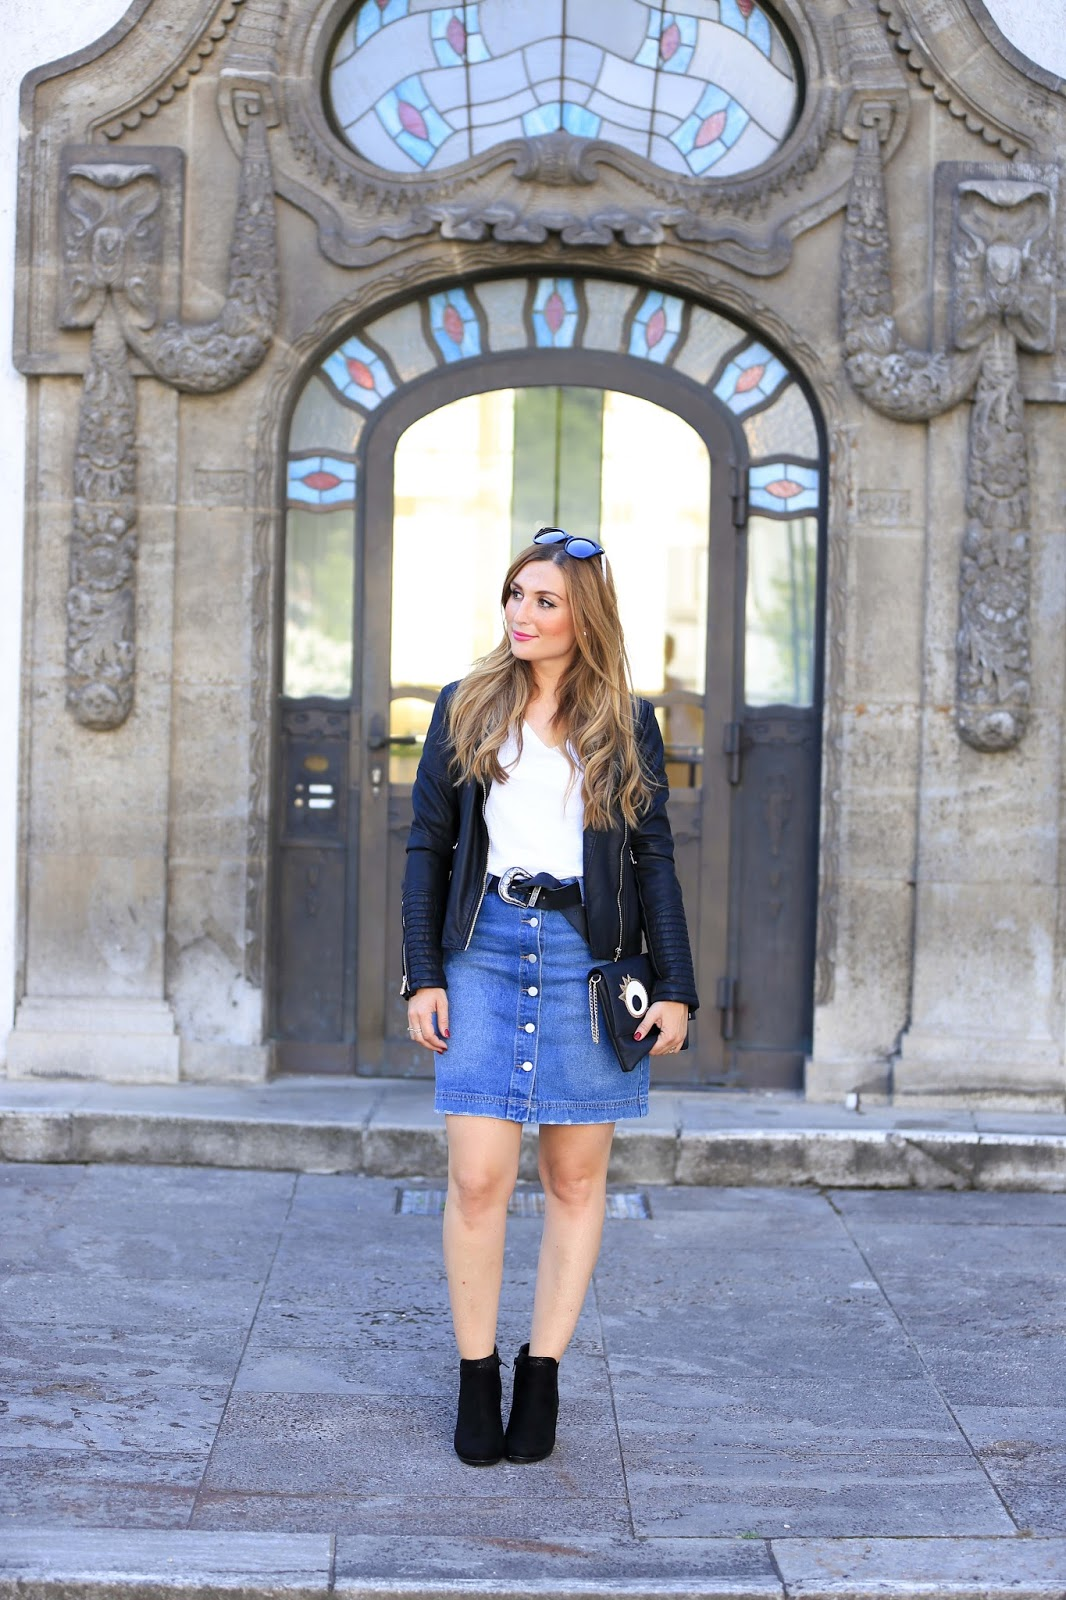 fashionstylebyjohanna-fashionblog-Frankfurt-munich-blogger-Wie kombiniere ich einen Jeansrock- wie trage ich boots-styleblog-Jeansrock-la-streetwear-chic